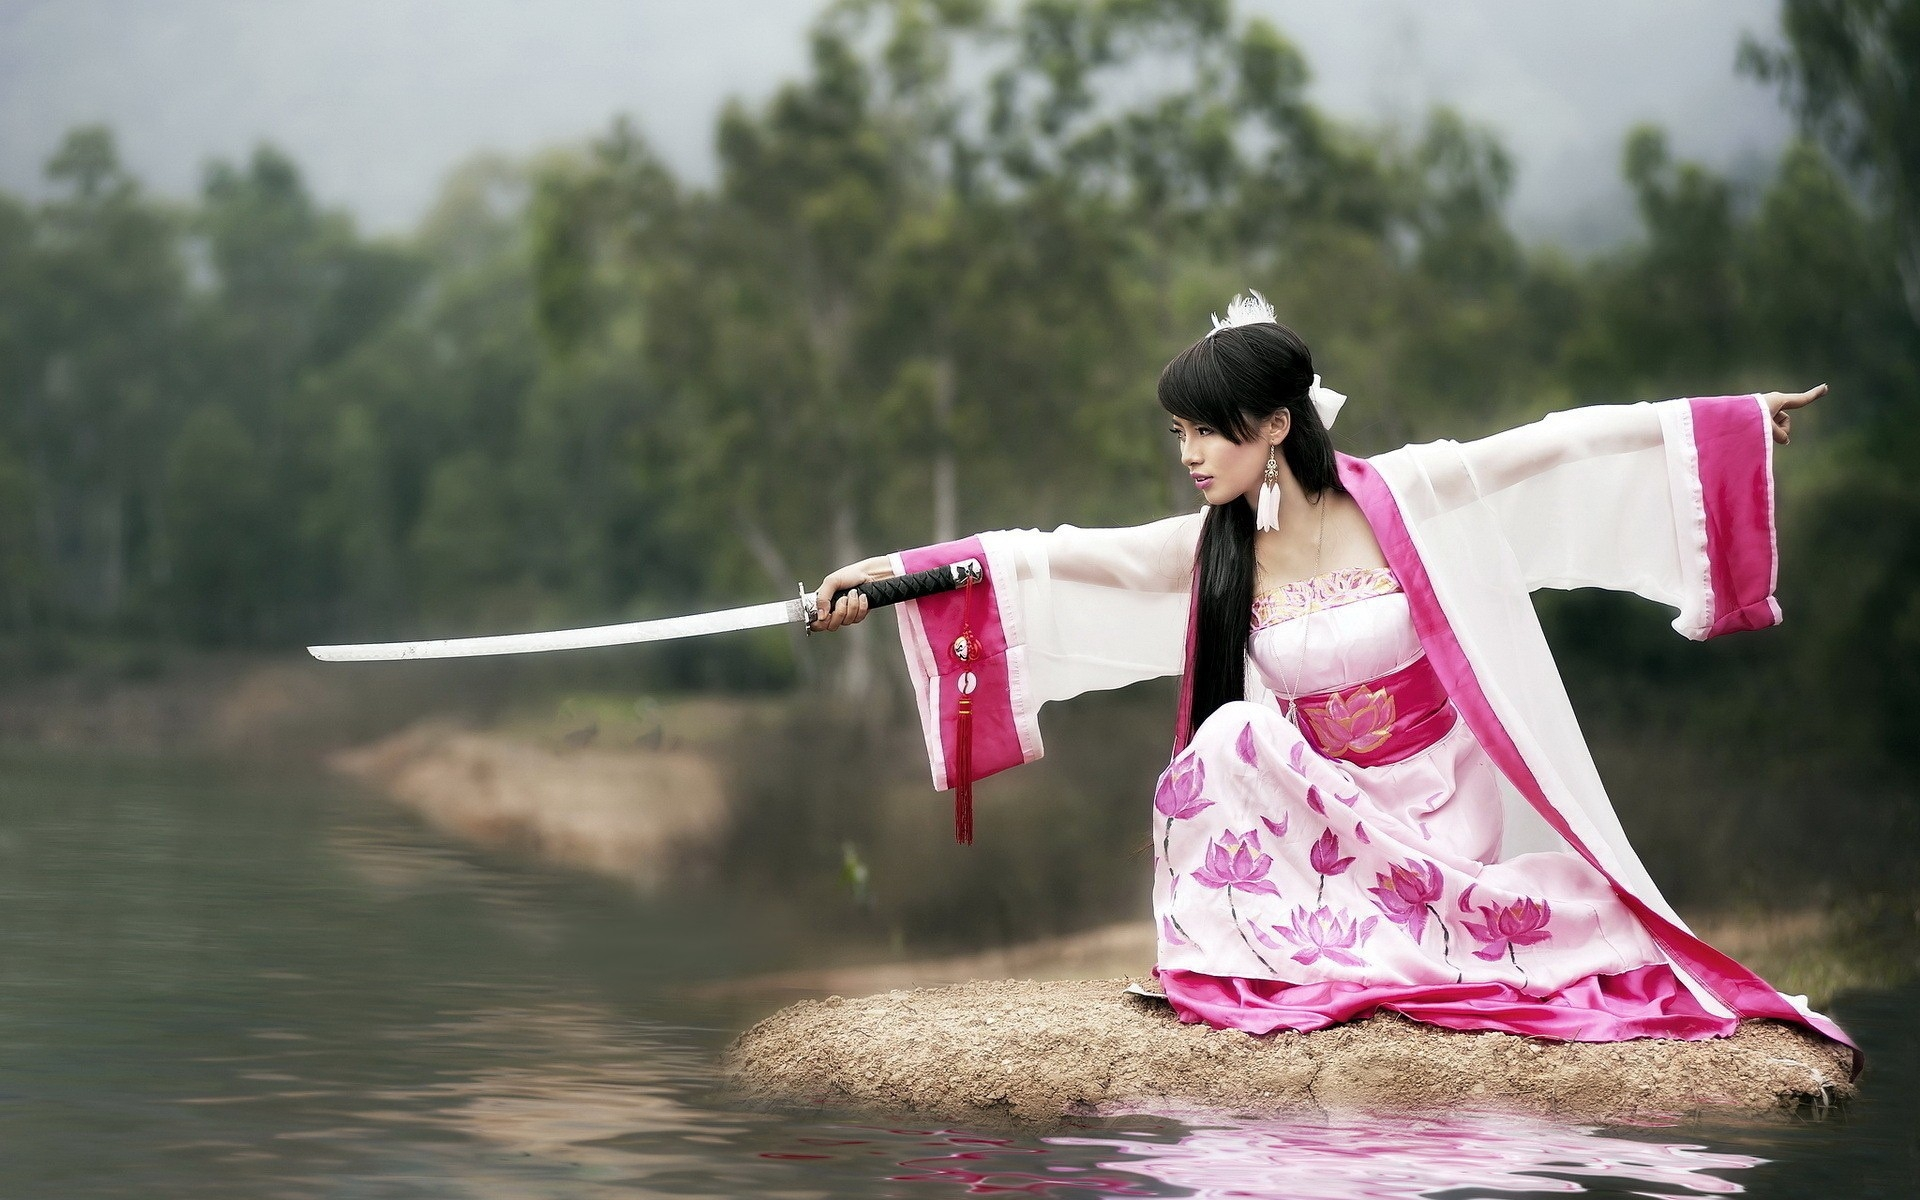 2560x1080 Girl Samurai Sword 2560x1080 Resolution